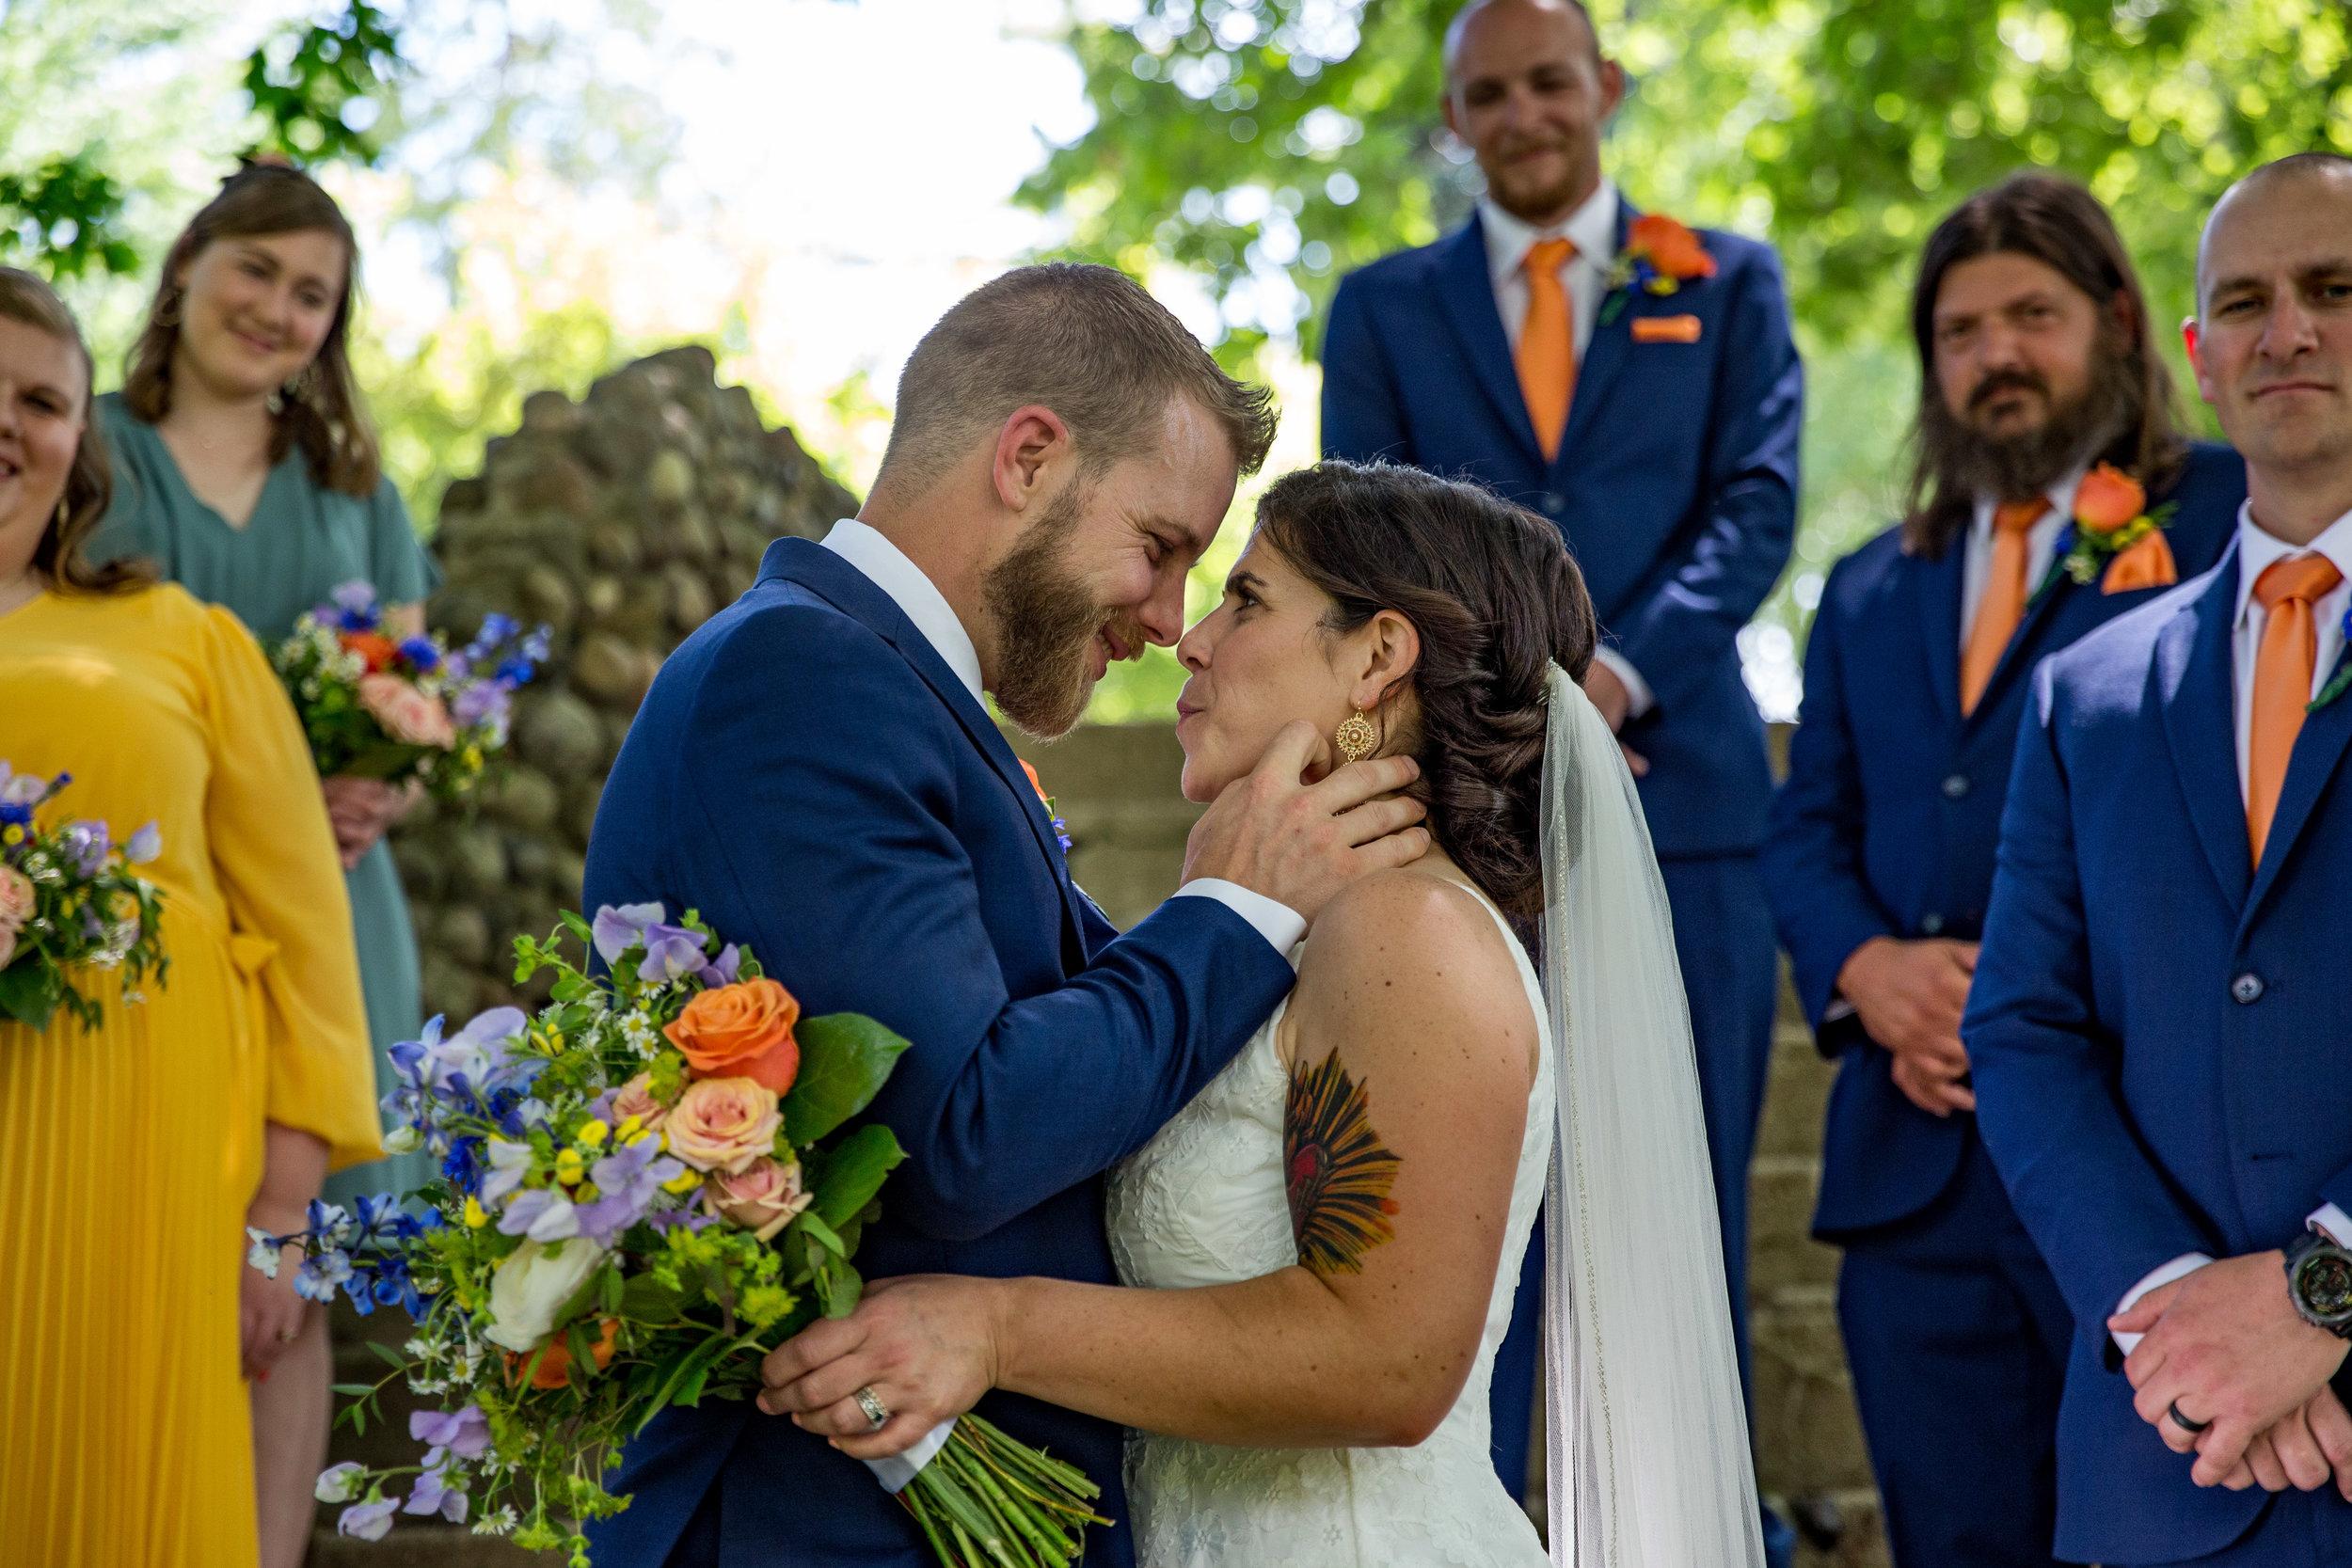 Natalie and Dallas Mooney Wedding 6-8-19_Tania Watt Photography-305.jpg